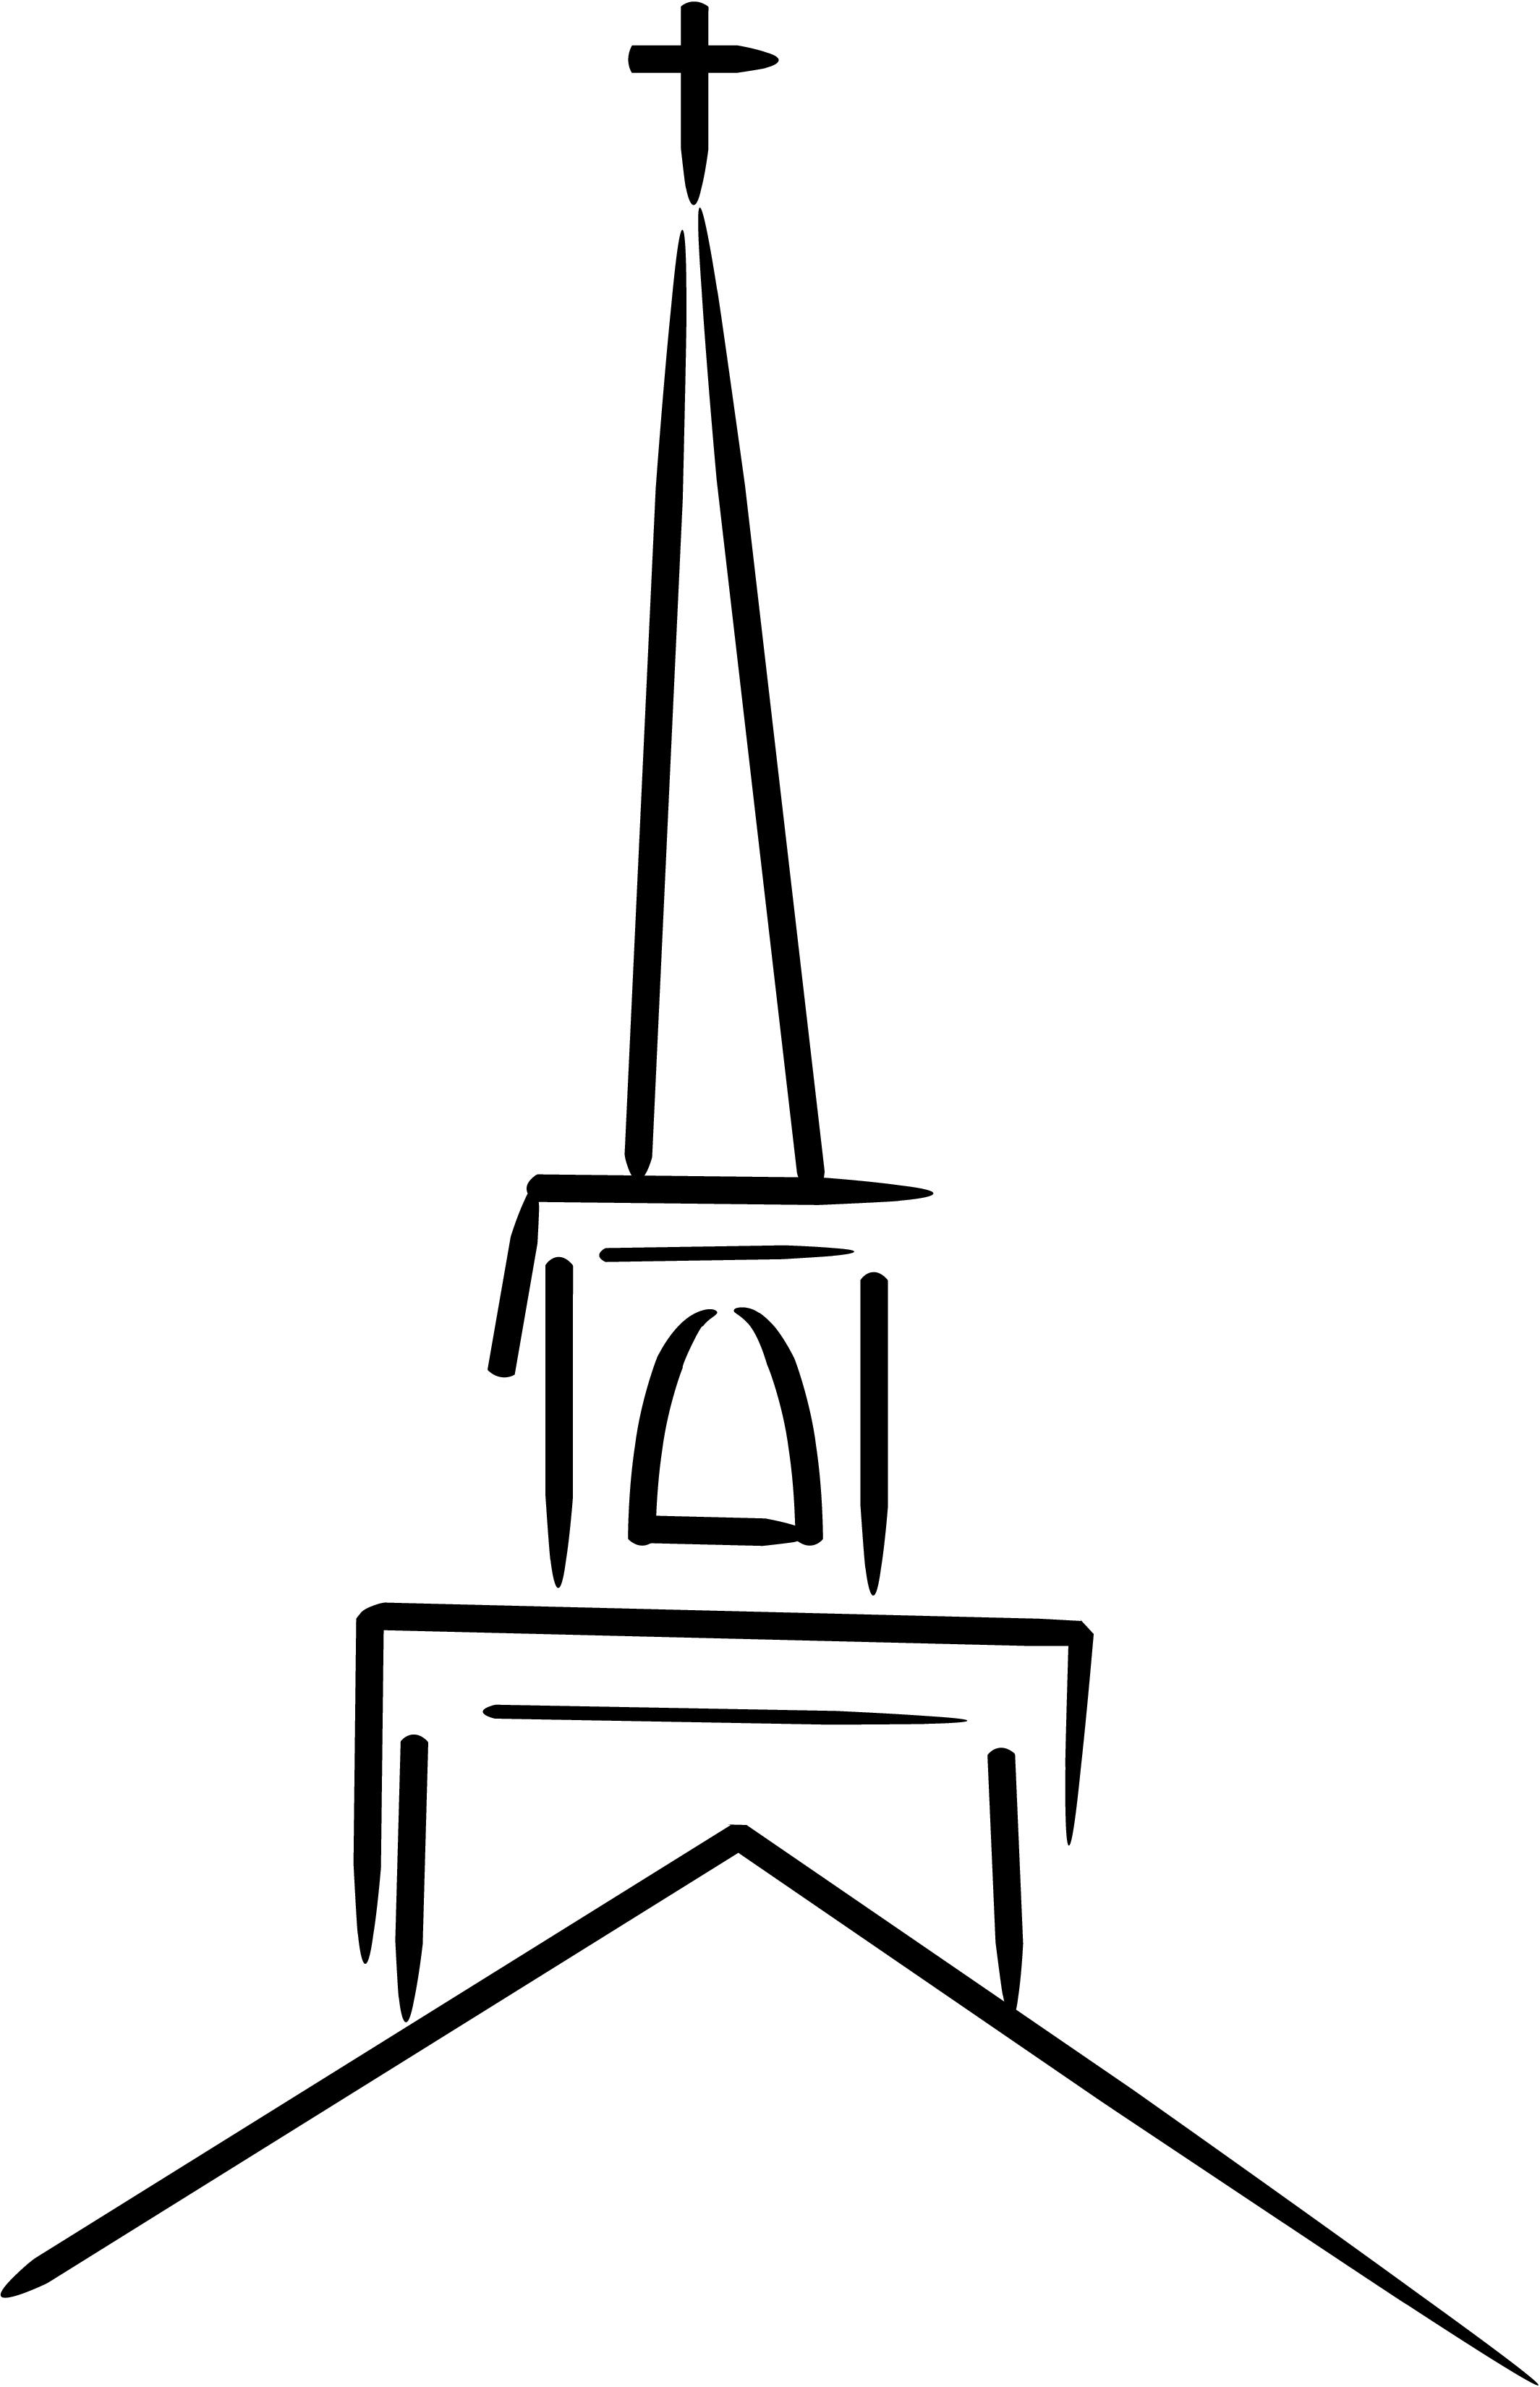 Steeple clipart Art Free Free Church Sketch